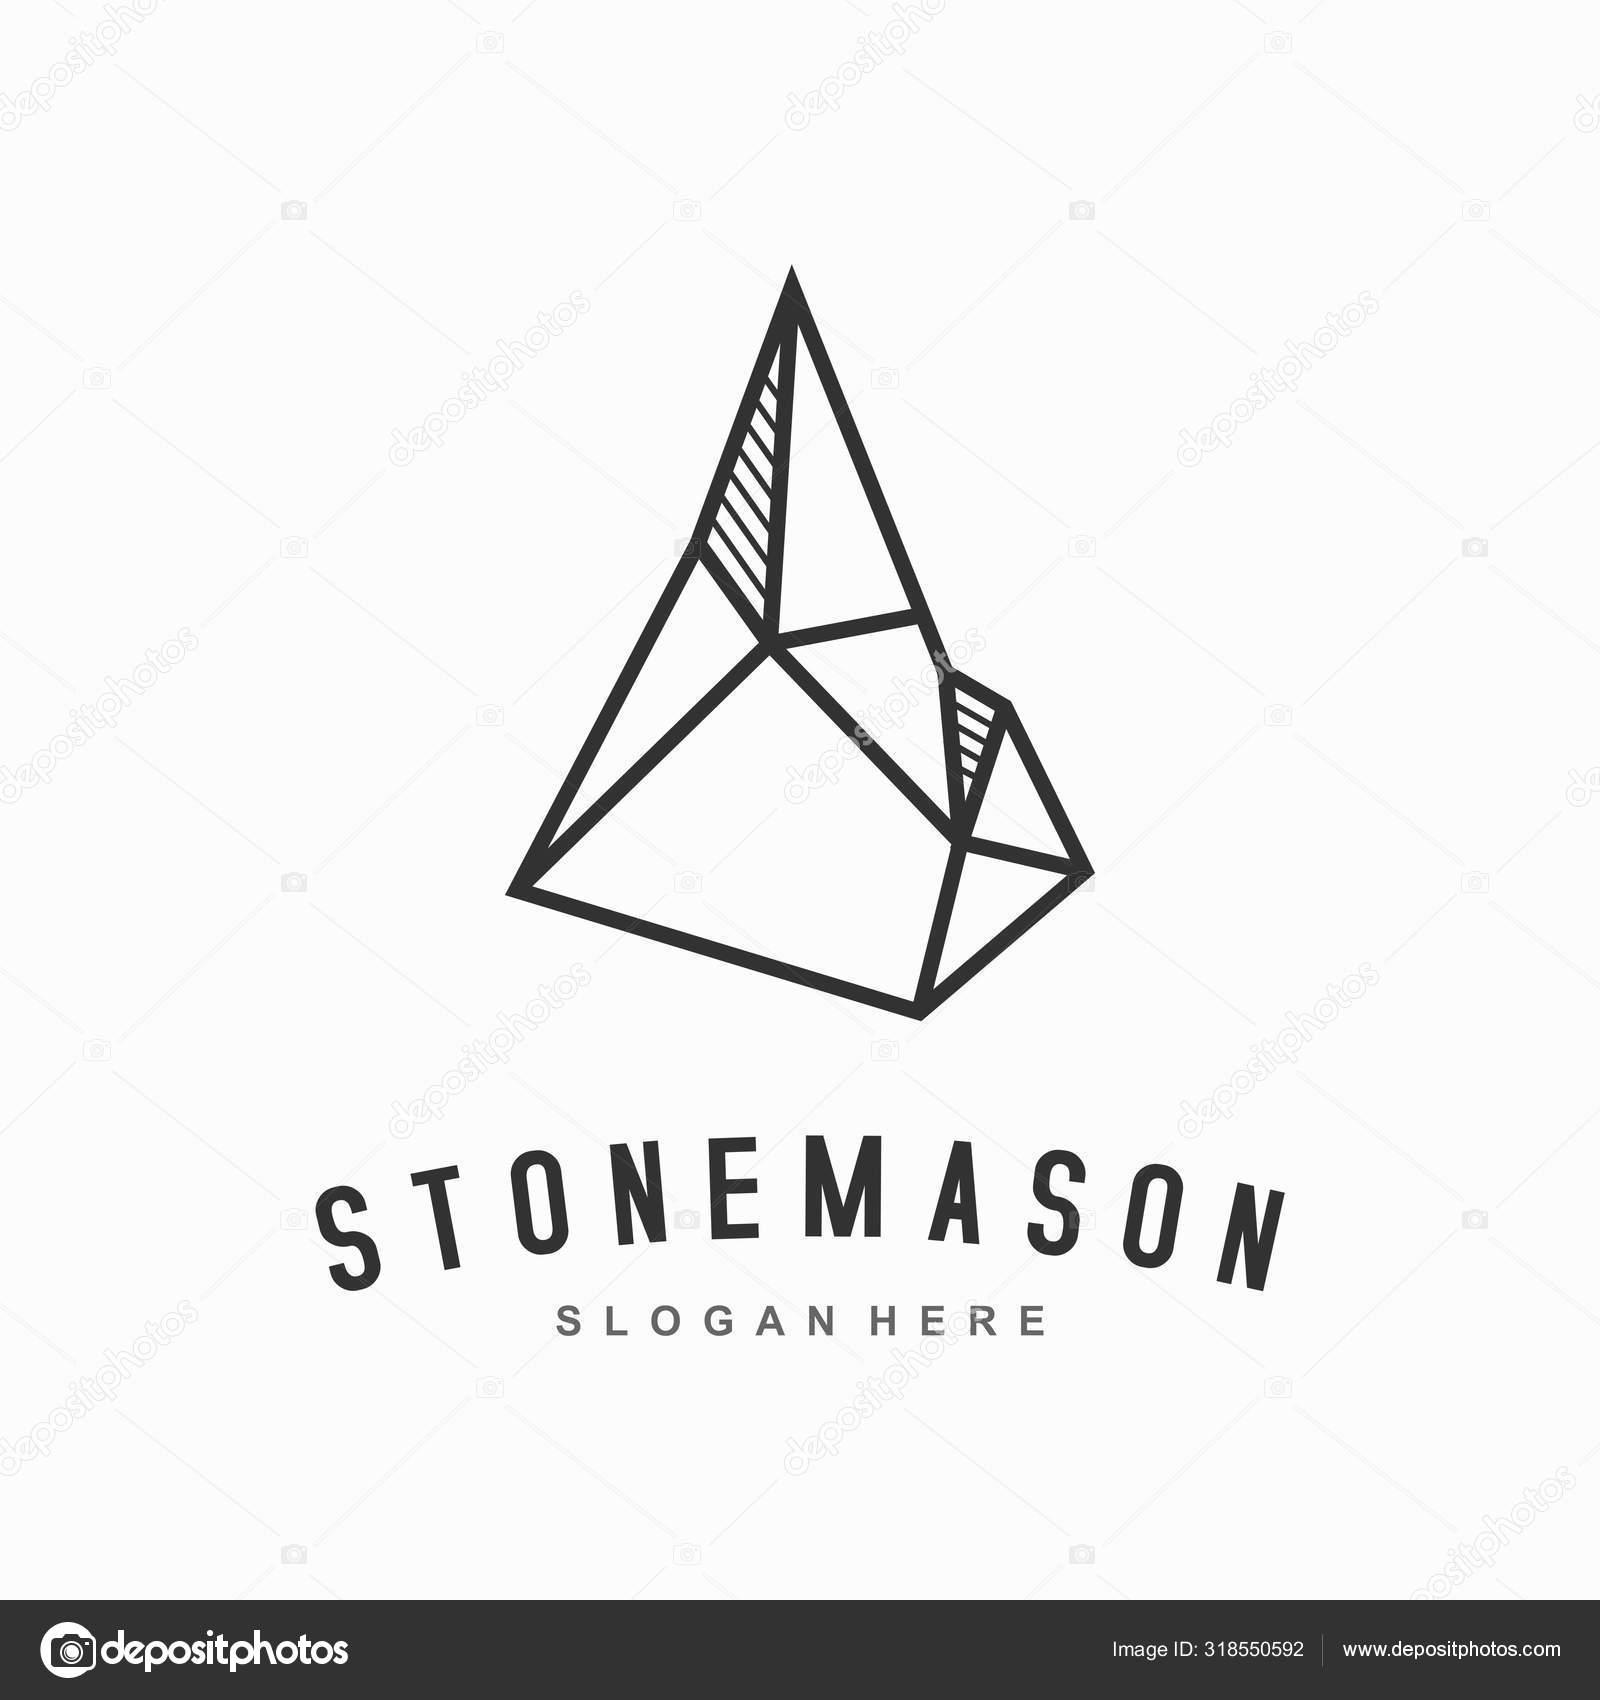 Geometric Line Art Template from st3.depositphotos.com